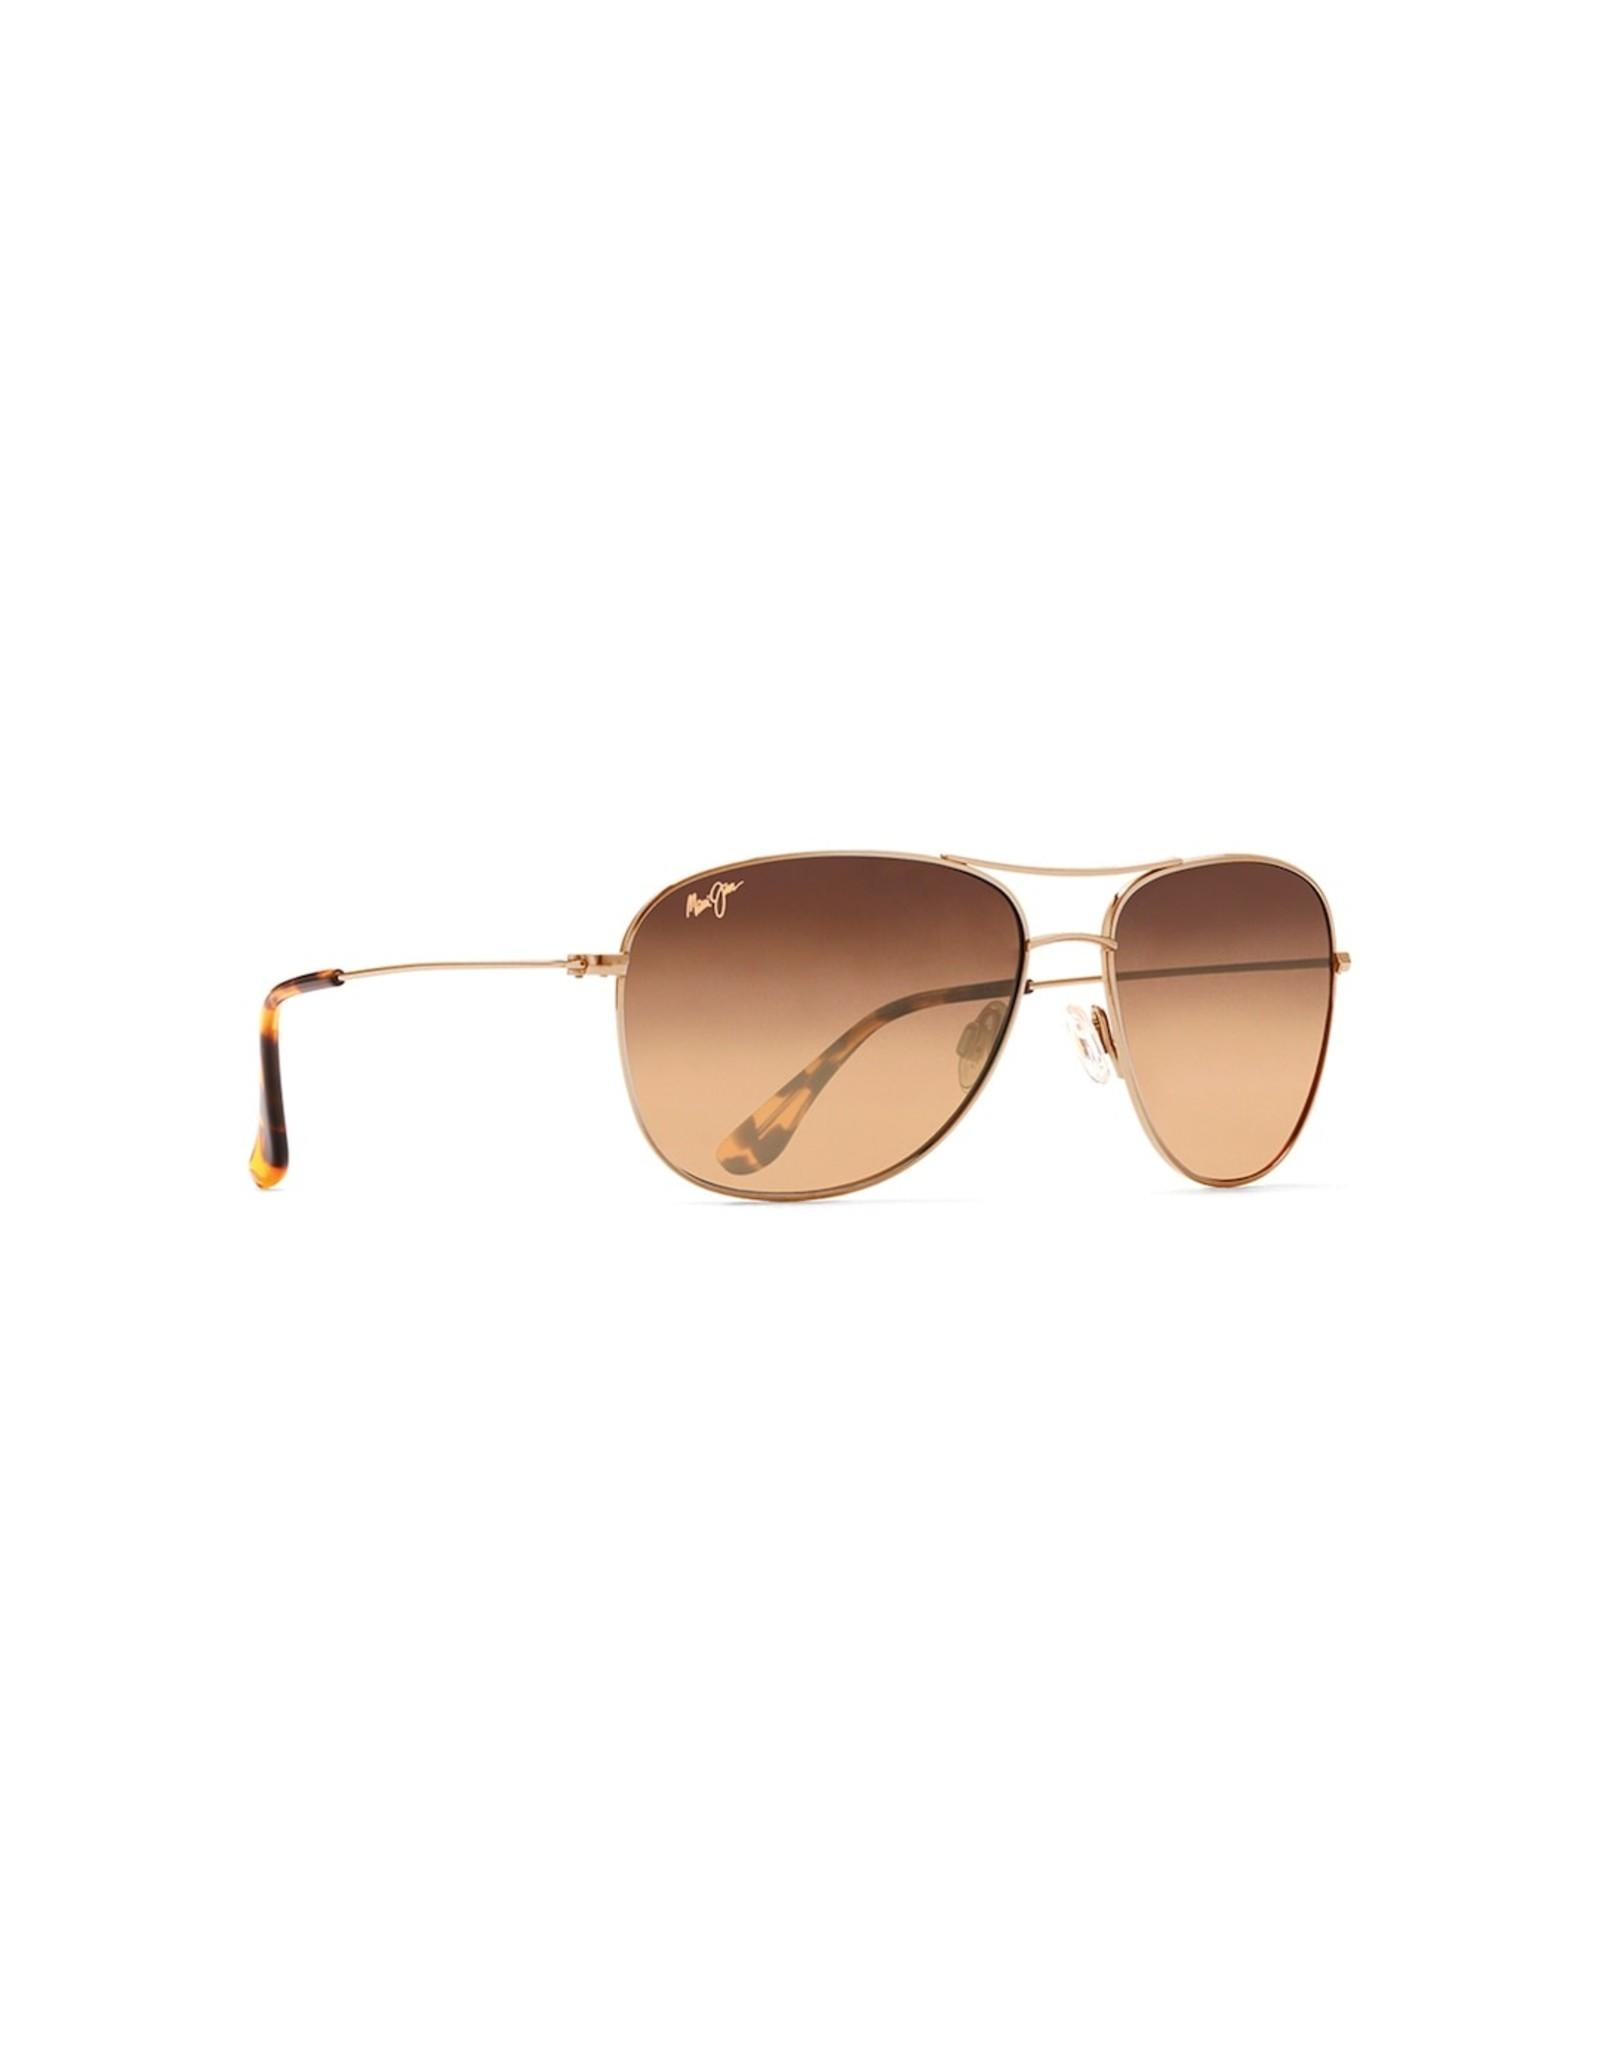 Maui Jim Maui Jim 'Cliff House' HCL Sunglasses